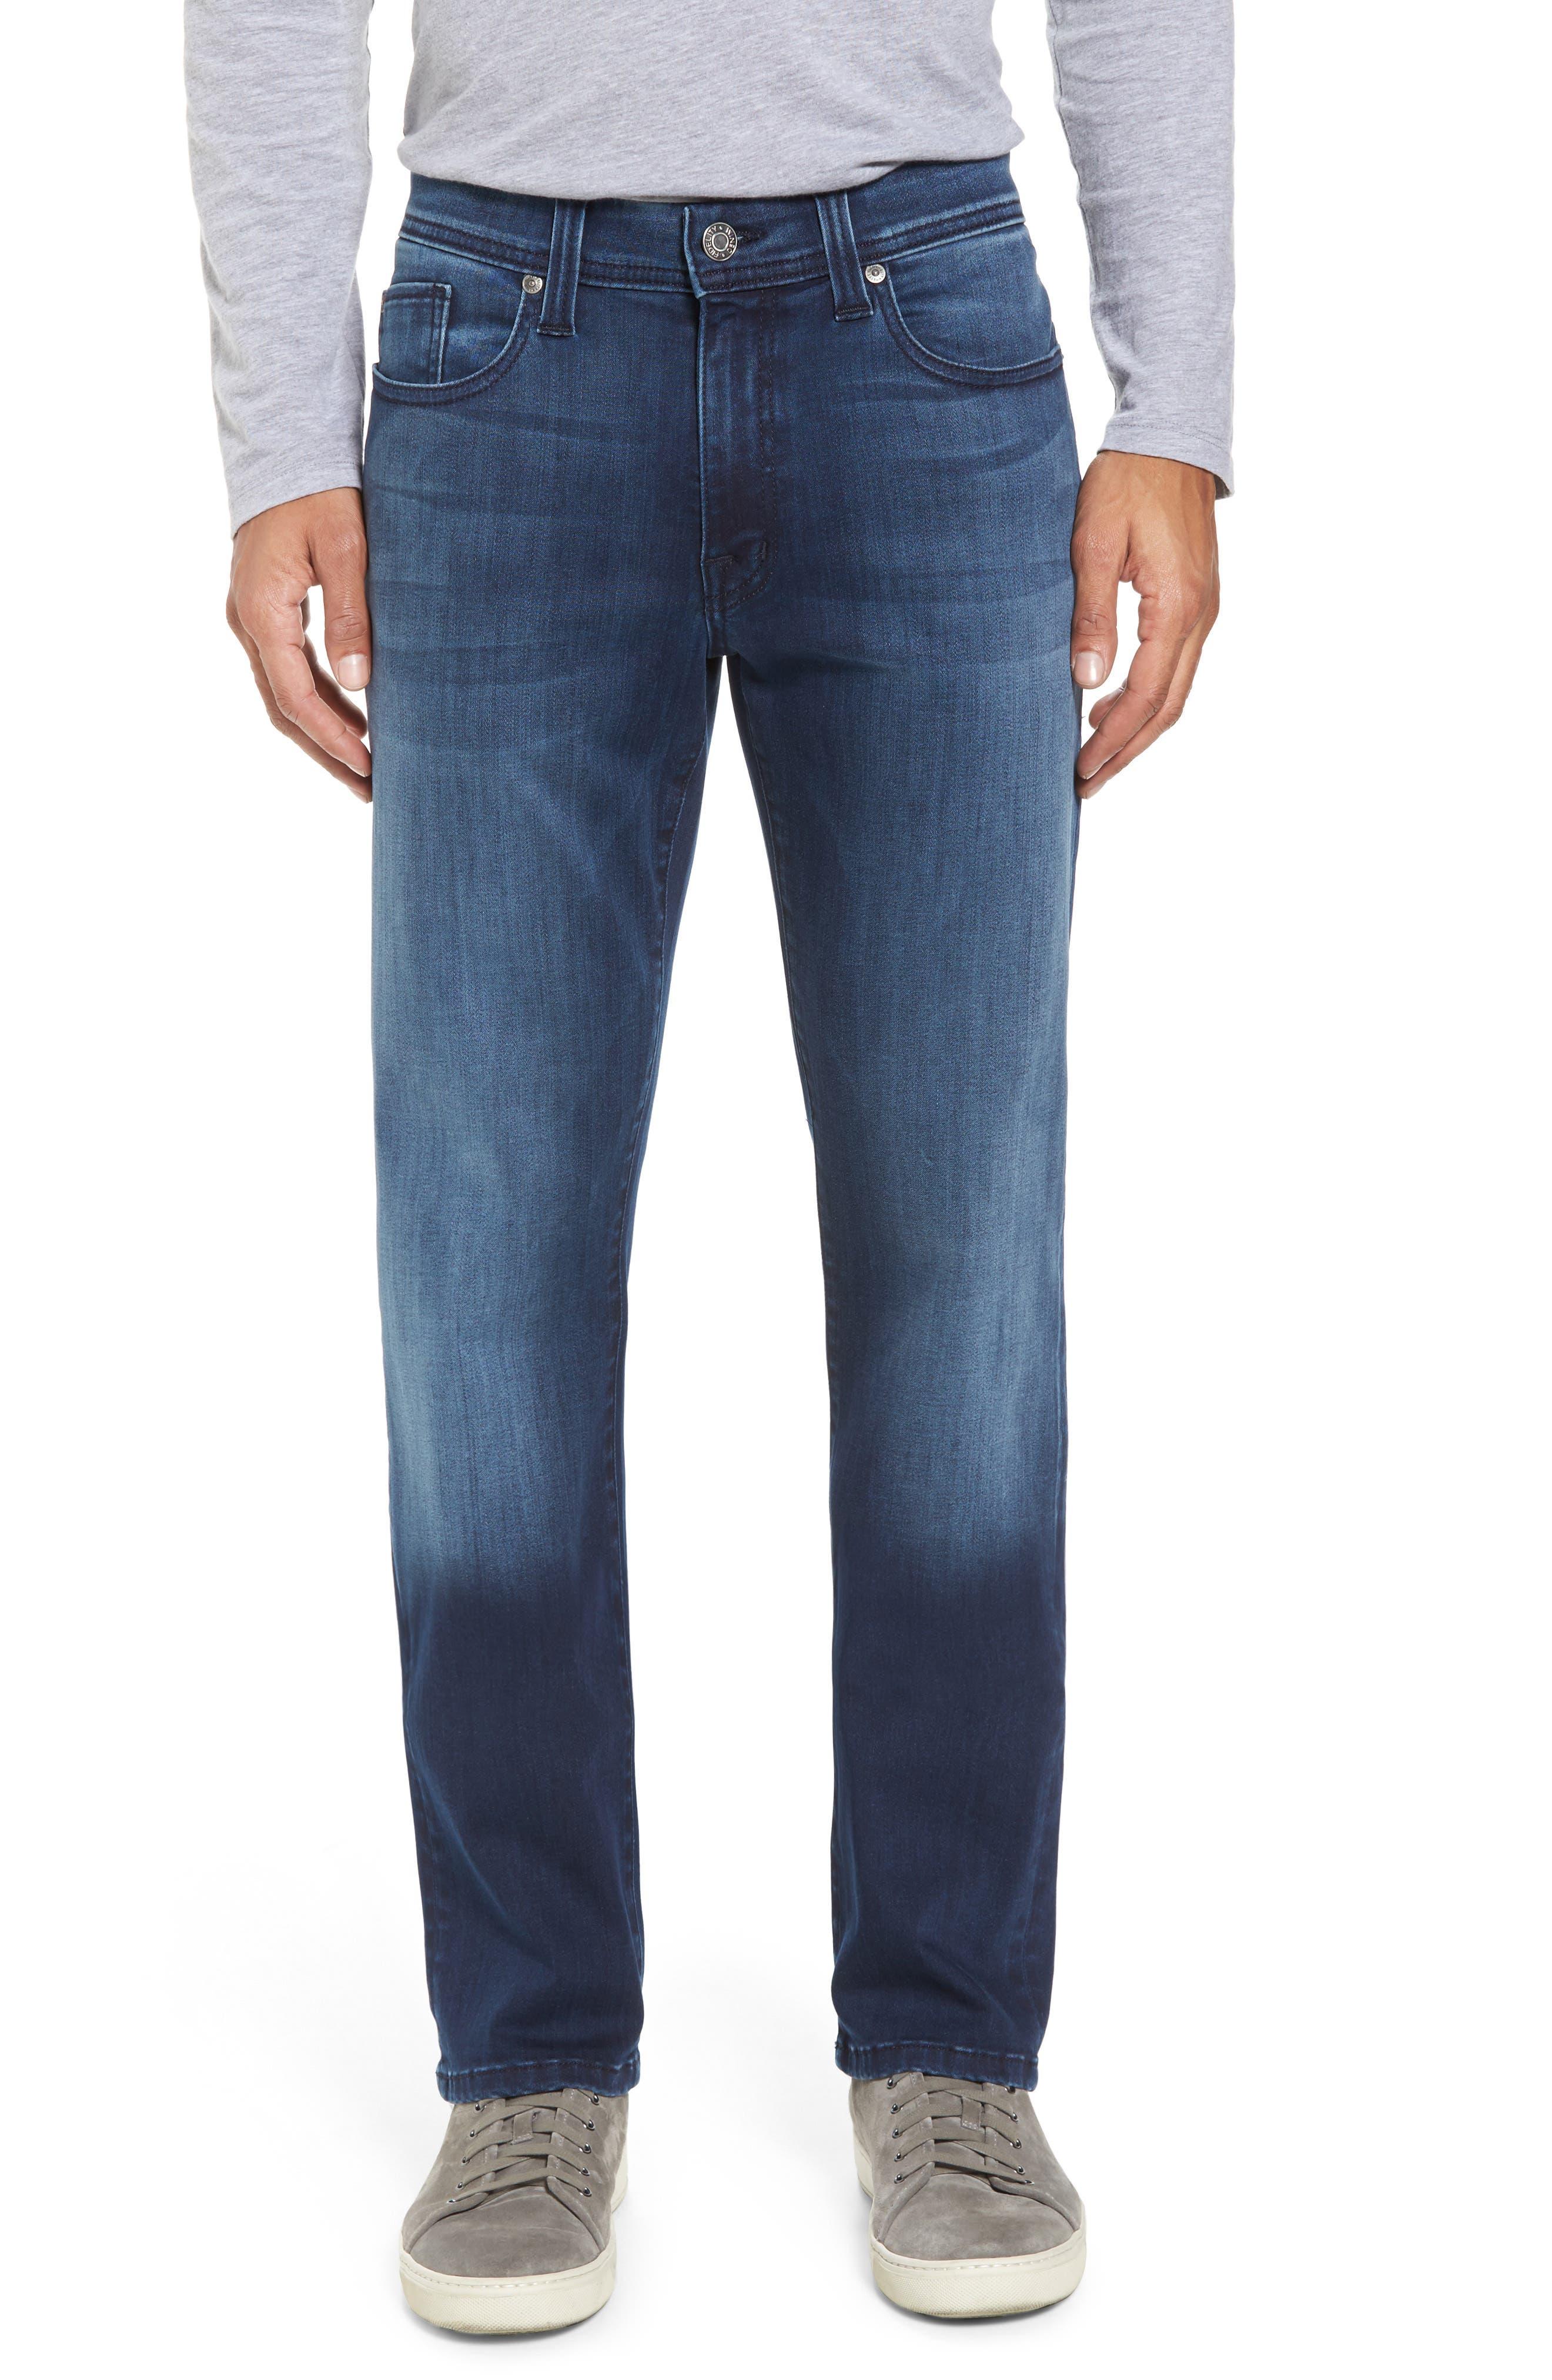 Fidelity Denim Jimmy Slim Straight Leg Jeans (Galaxy Blue)